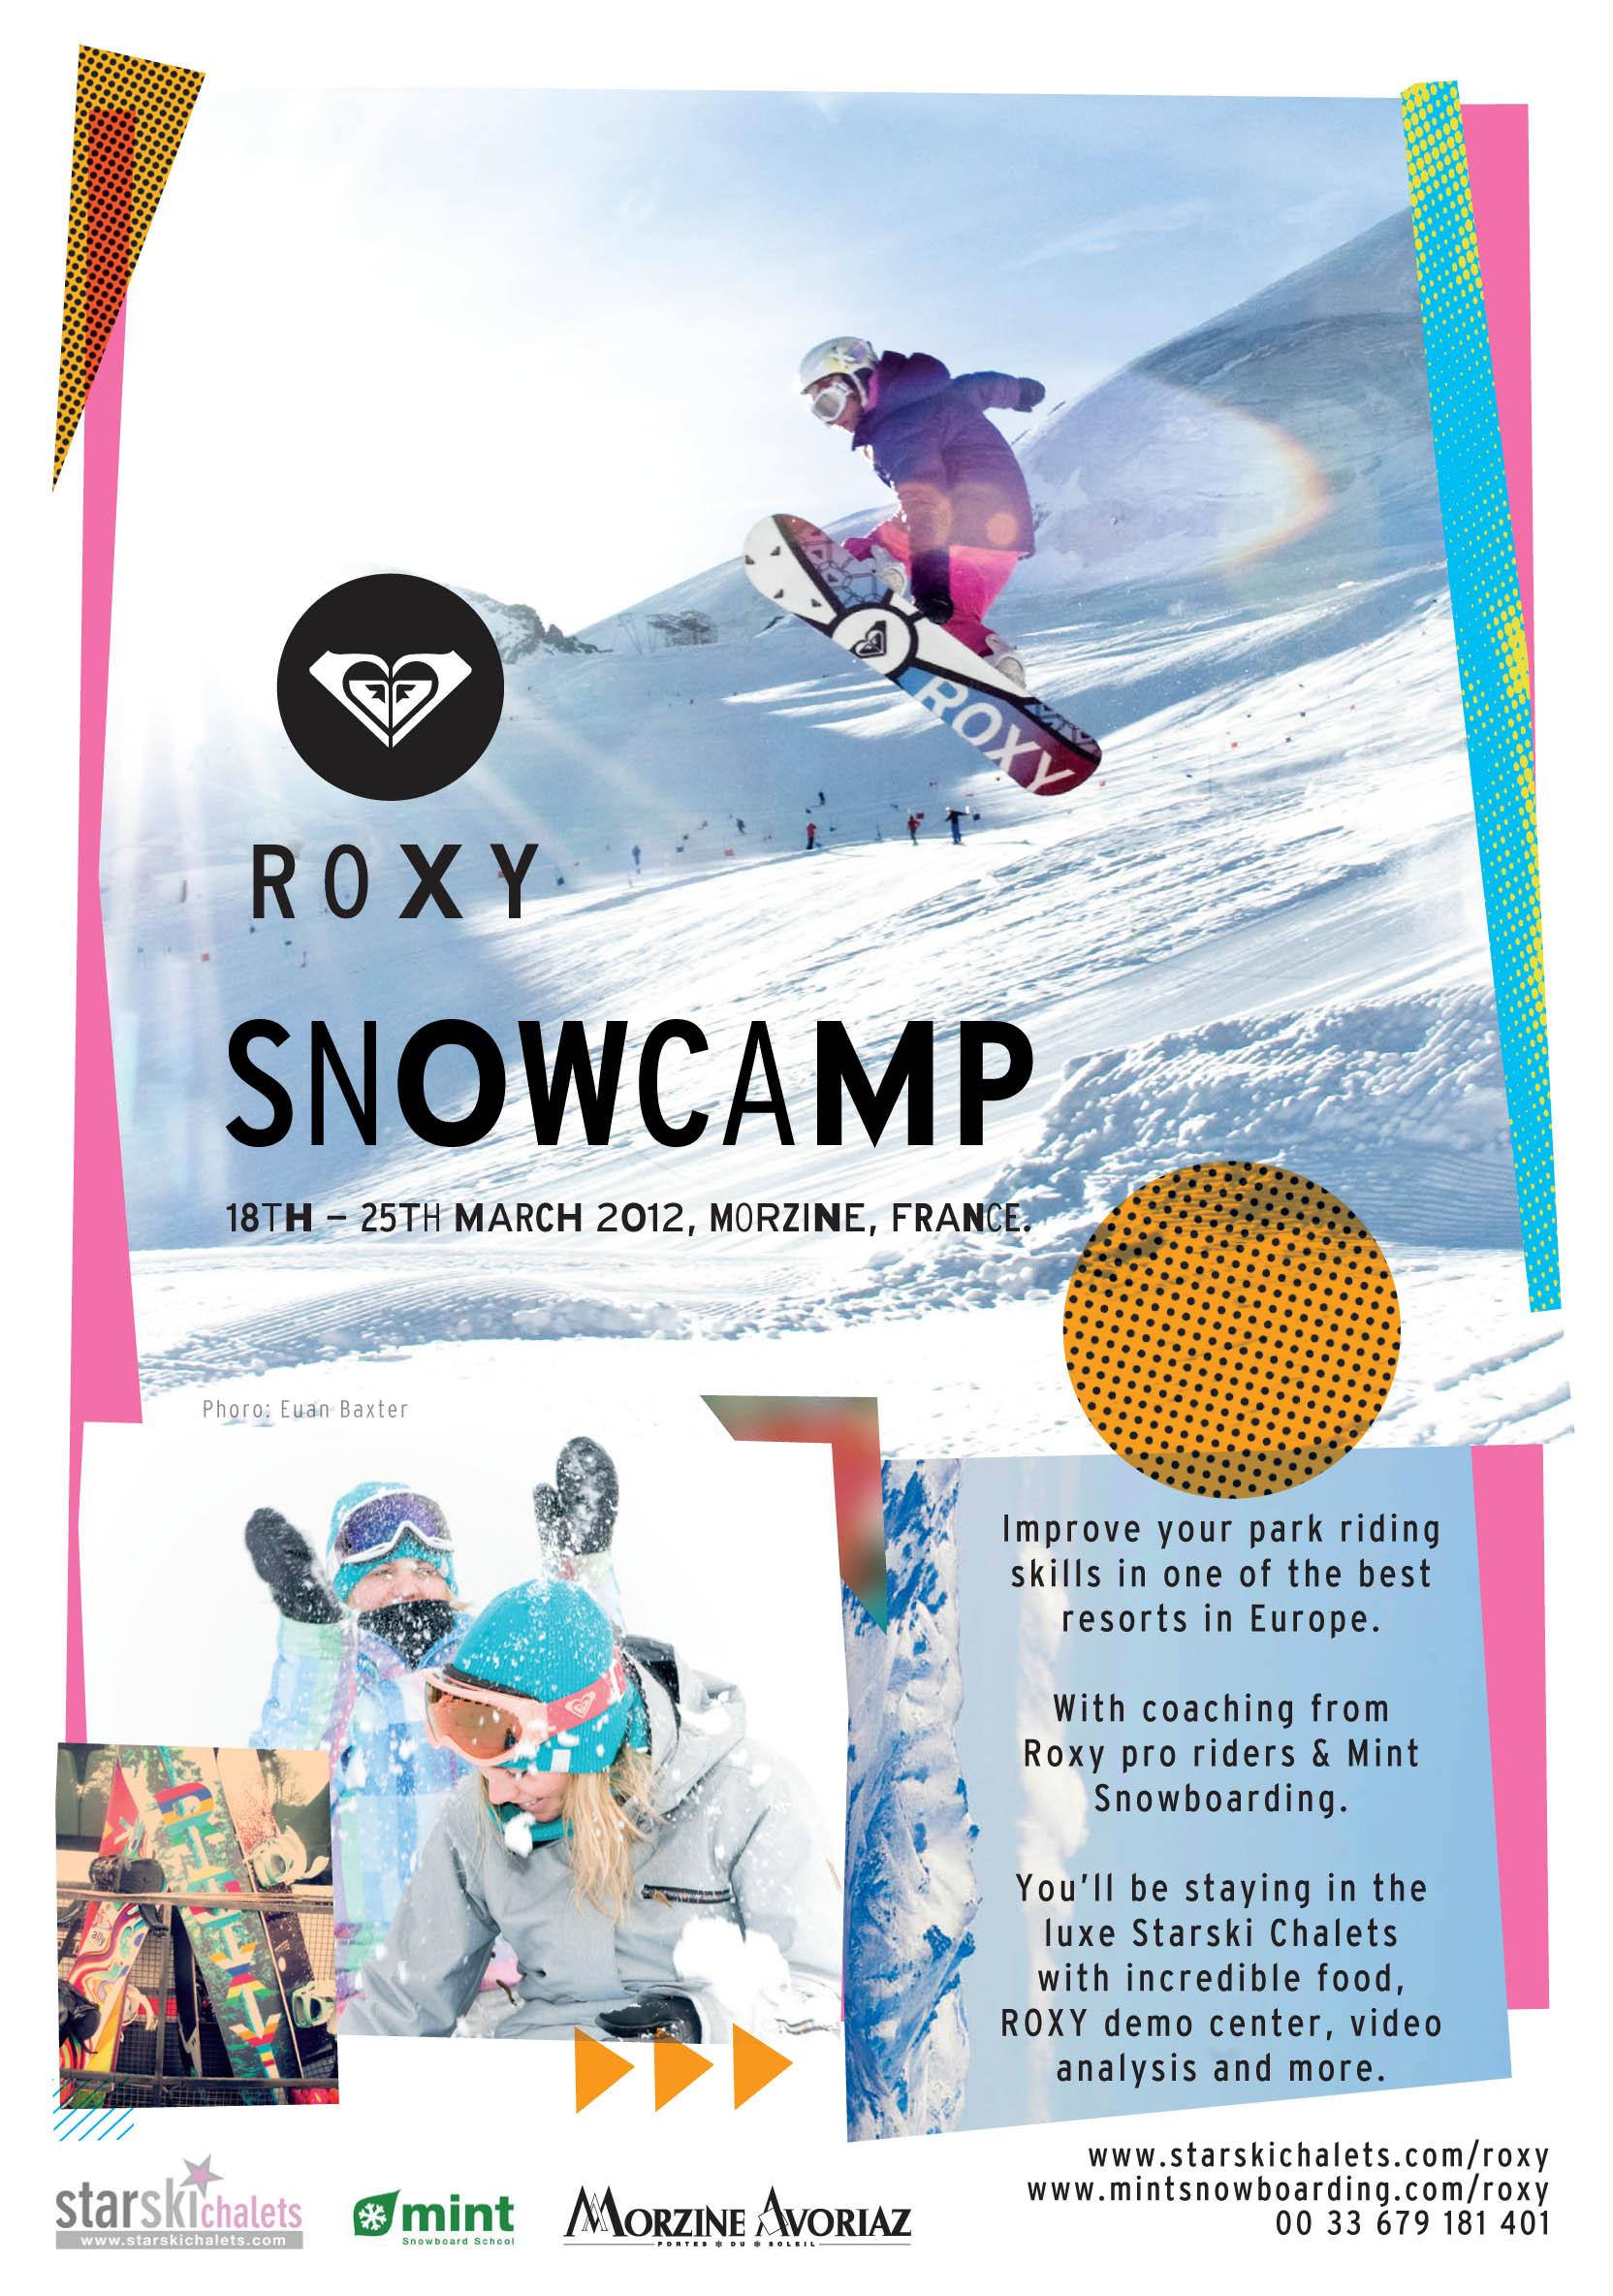 Roxy Snowboard Camp 2012, Morzine